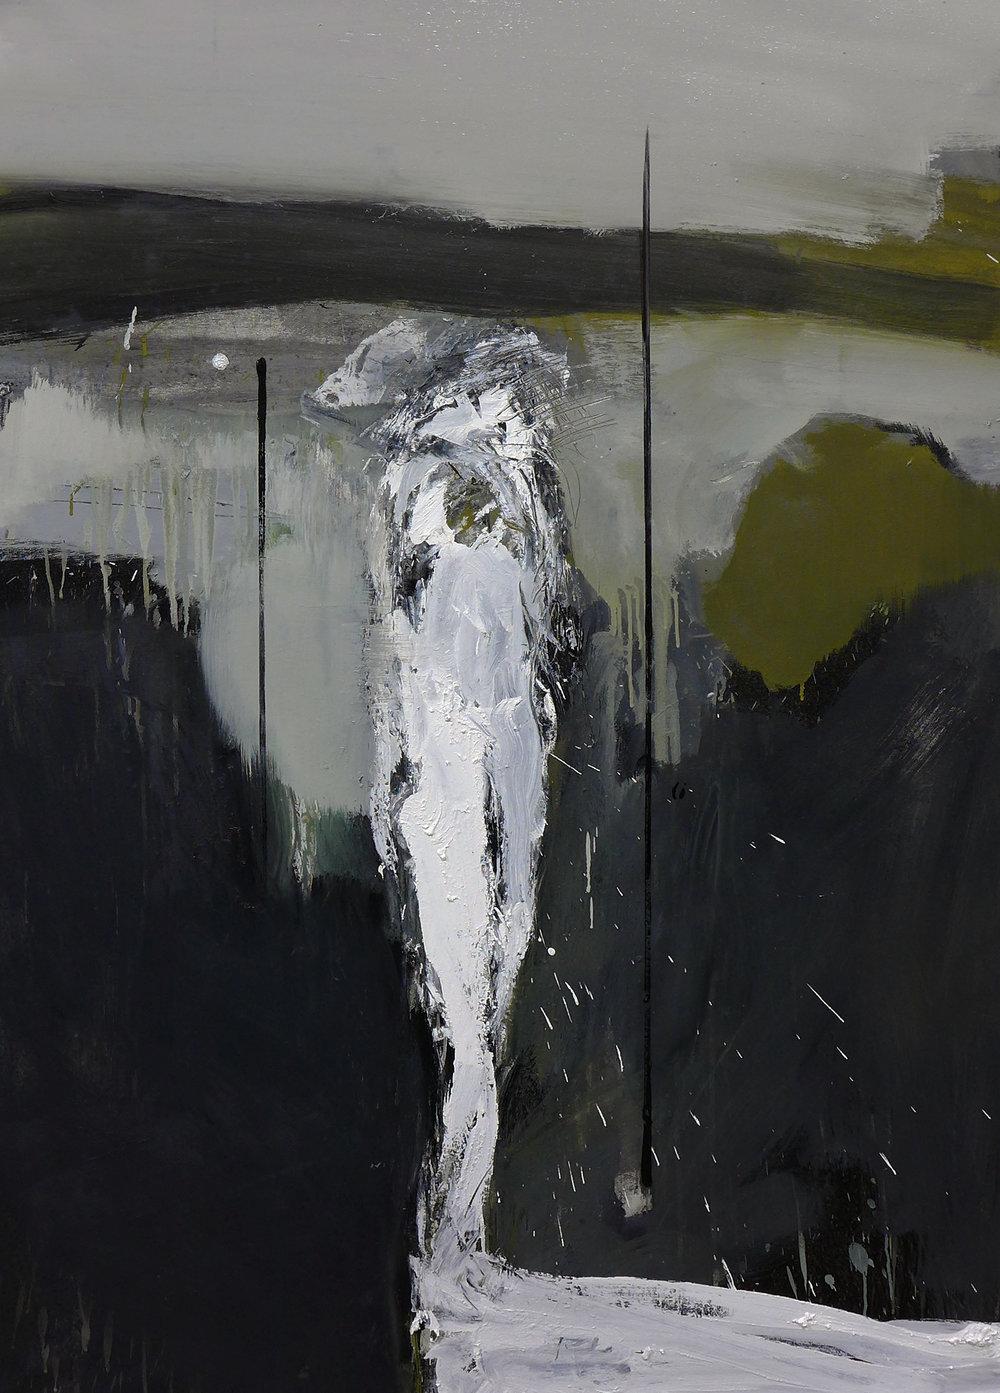 Hombre sin titulo,  2016  Óleo sobre lienzo  140 x 100 cm